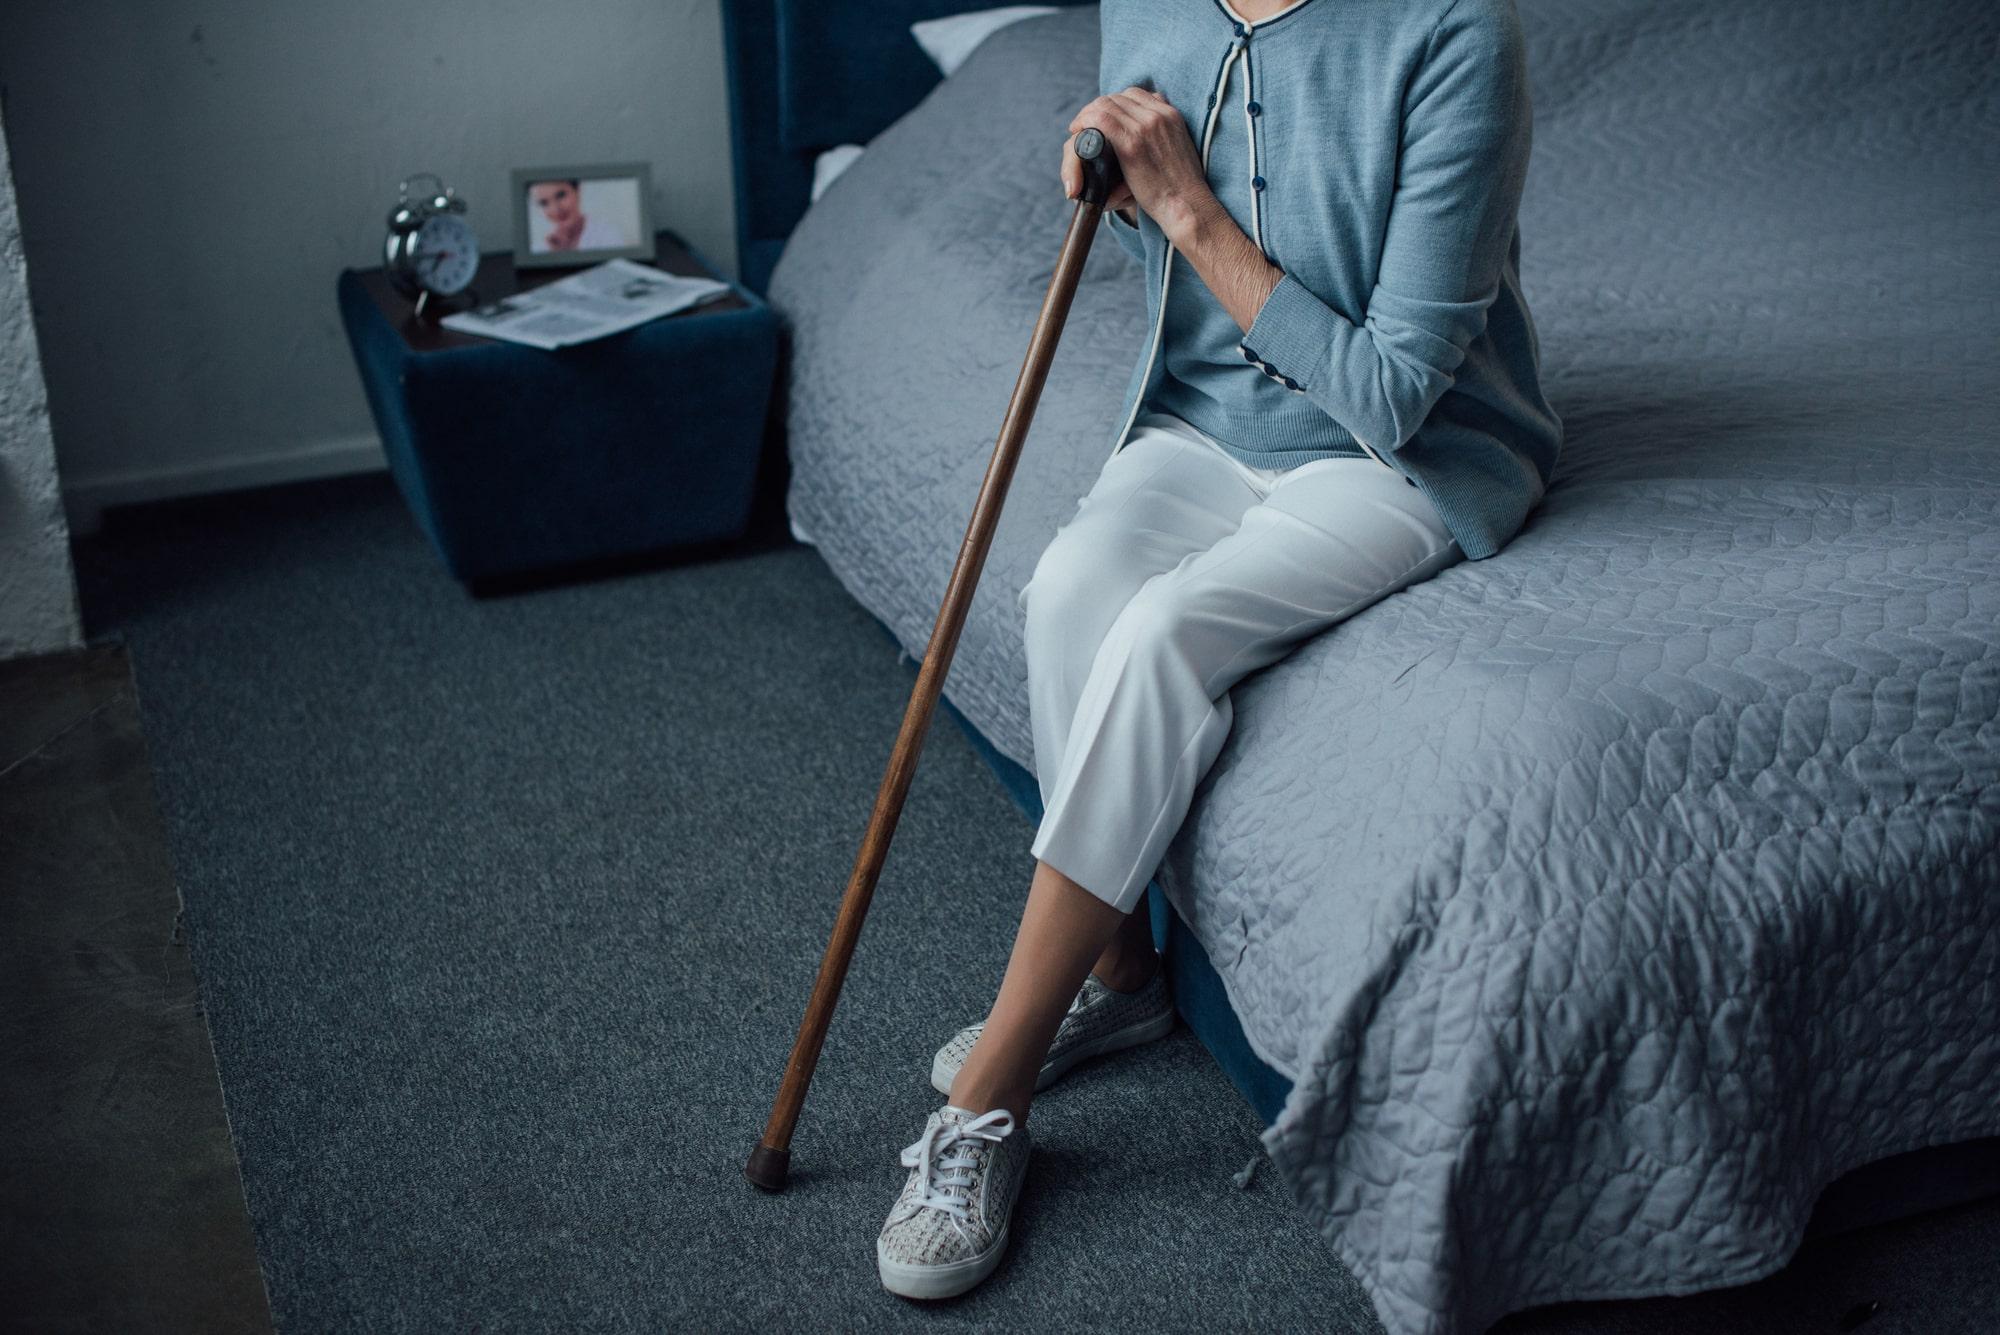 Seniors With Arthritis